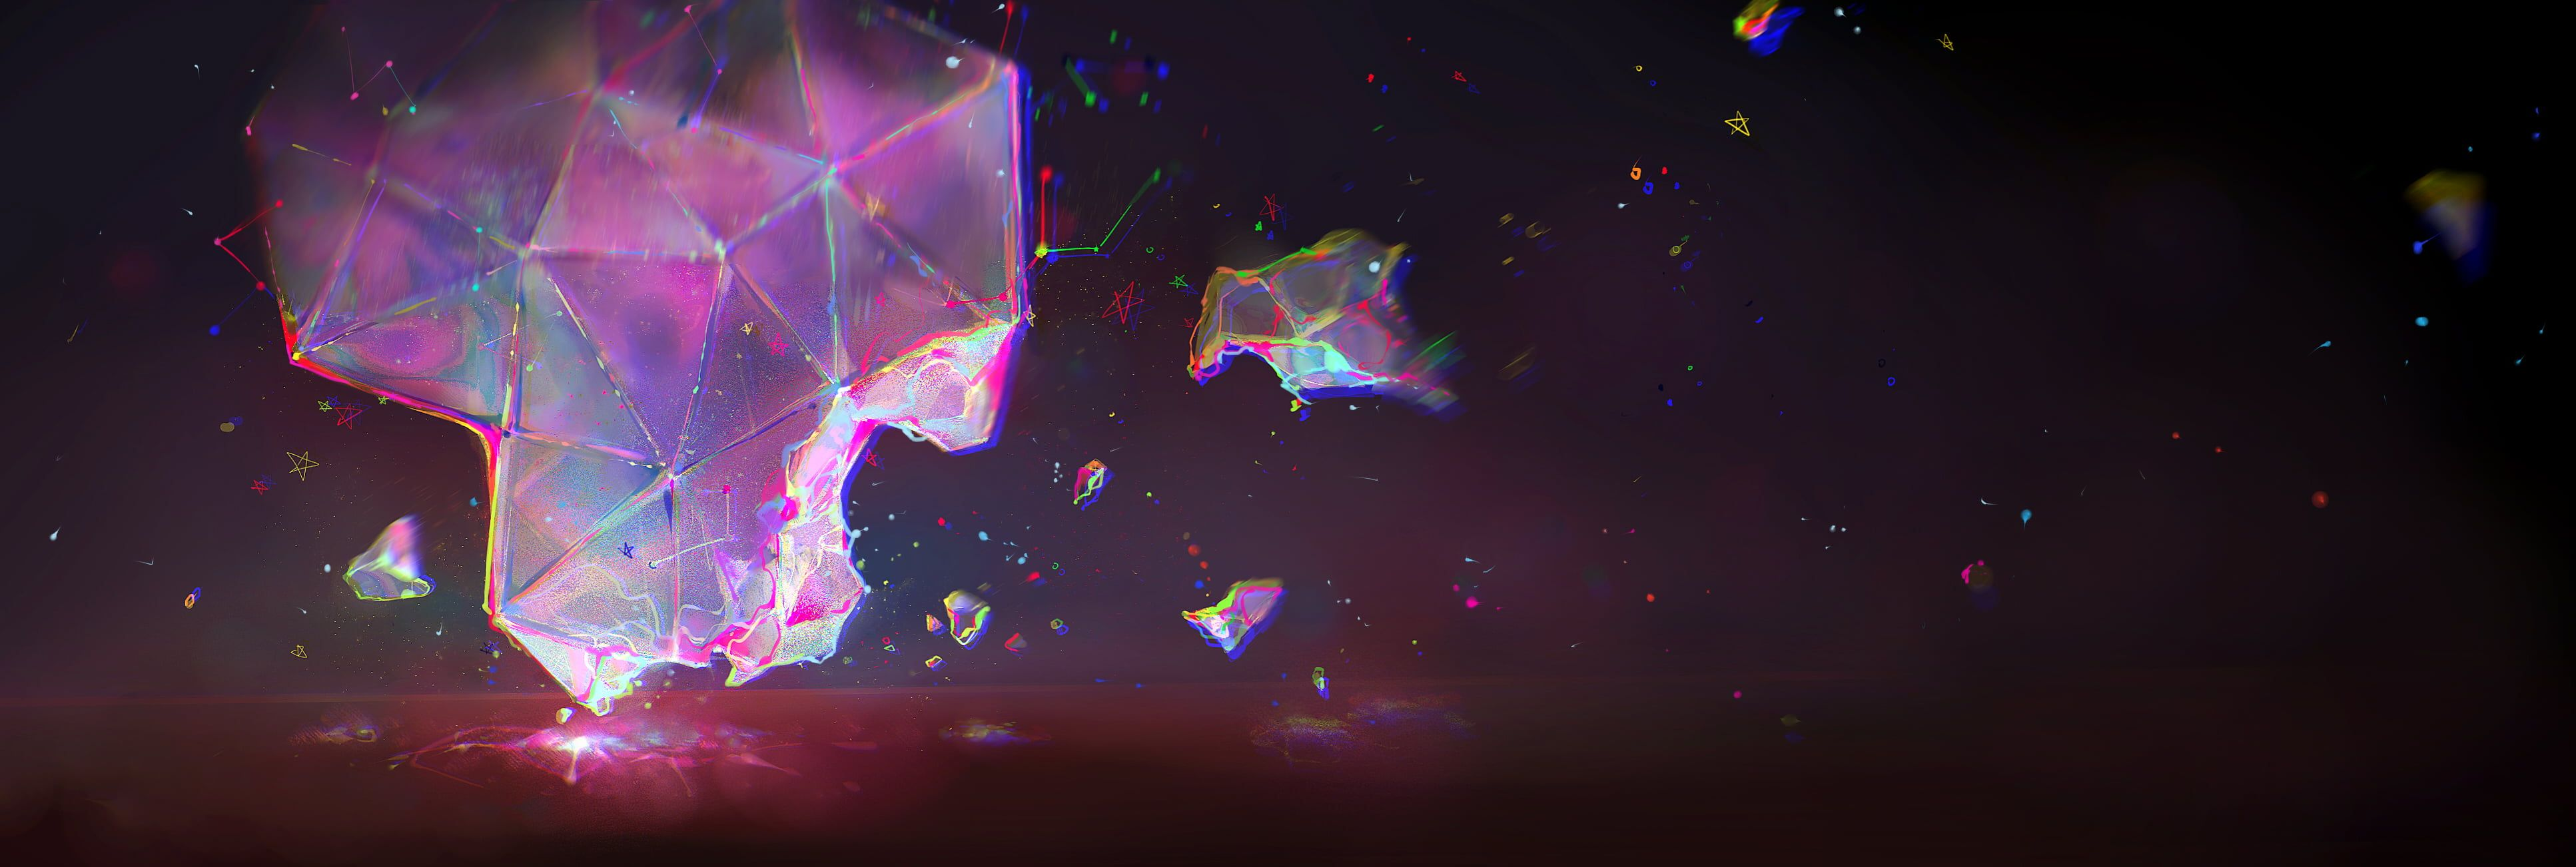 Bismuth Gemstone Digital Art Abstract Rgb Triangle Geometry Stars Minimalism 4k Wallpaper Hdwallpa In 2020 Desktop Wallpaper Abstract Black And Blue Wallpaper